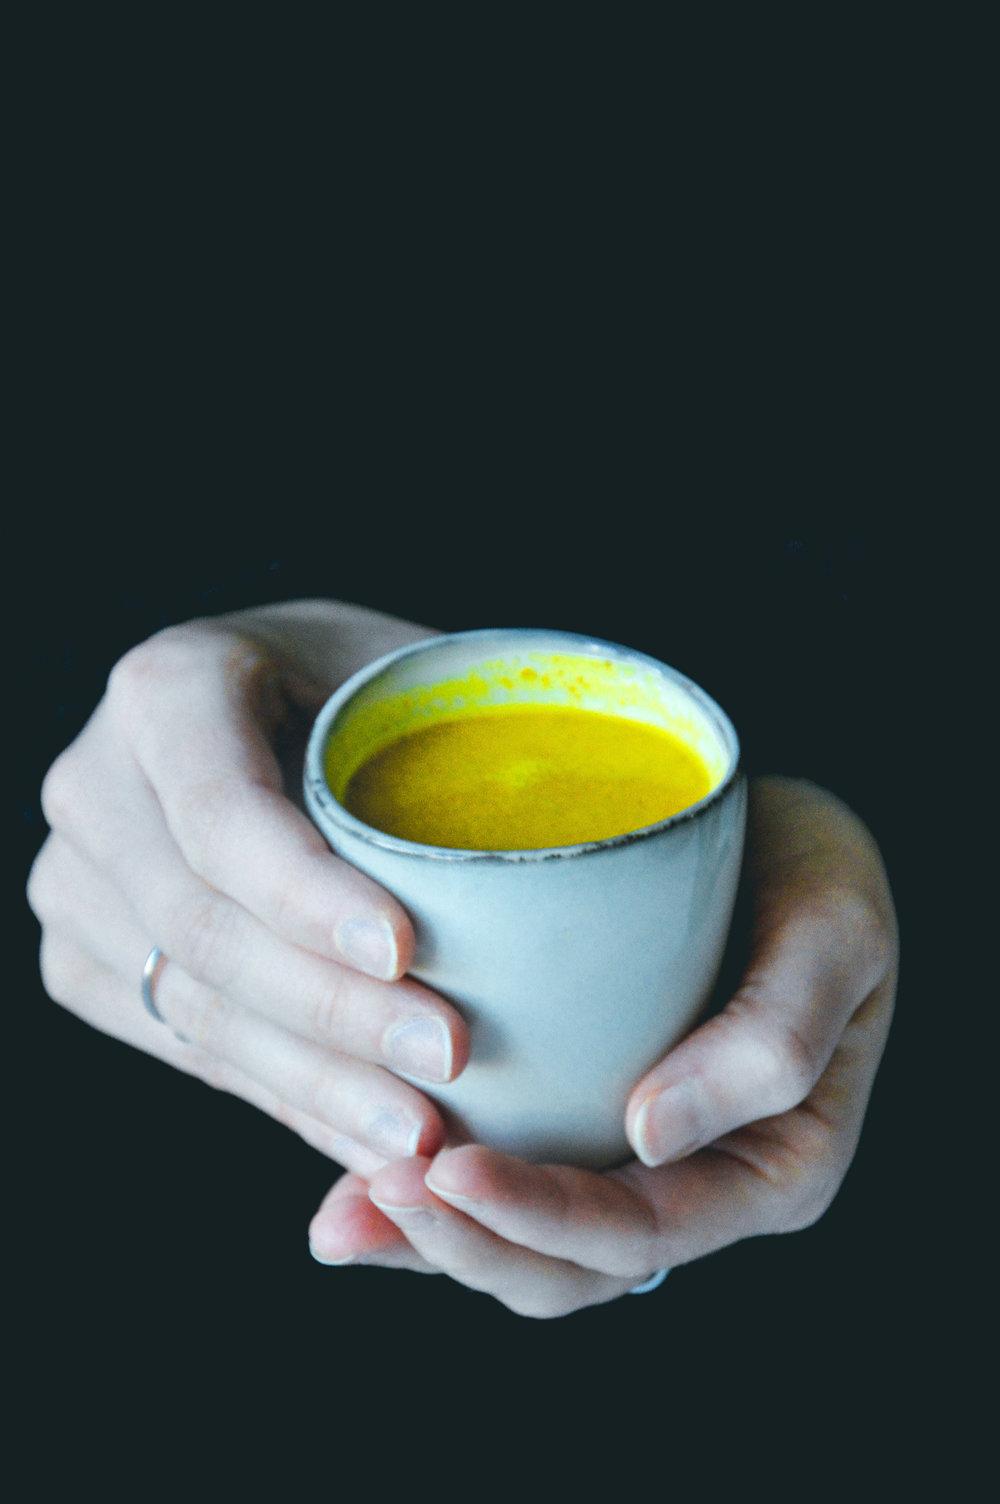 金牛奶- the healthy turmeric drink | 北欧厨房